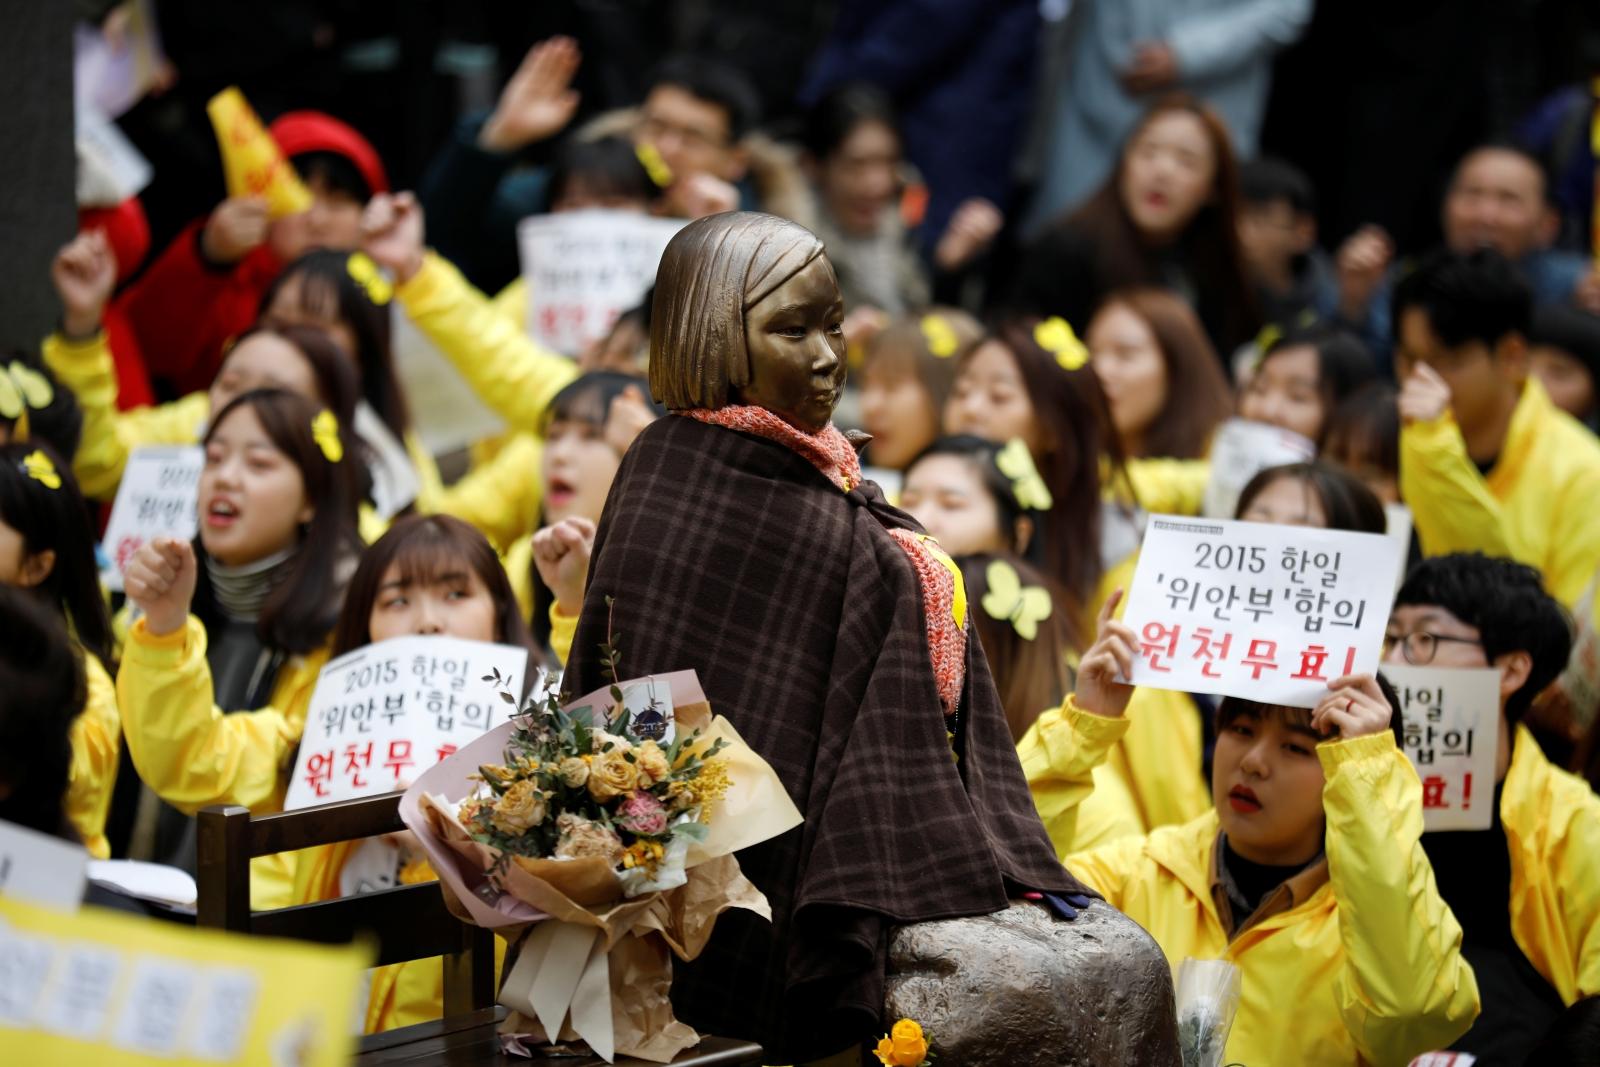 Japan South Korea relations